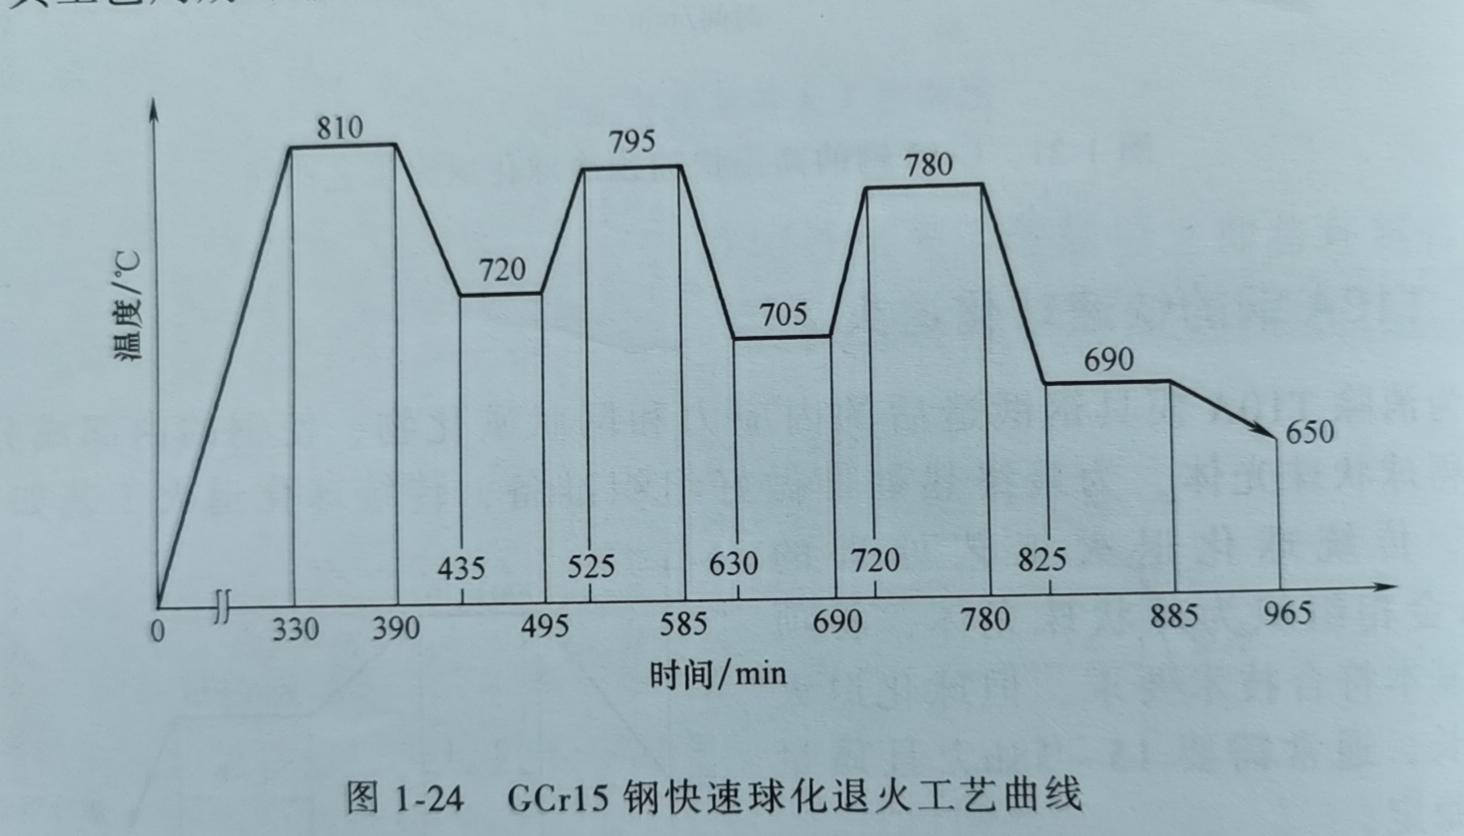 Gcr15 钢的快速球化退火曲线图